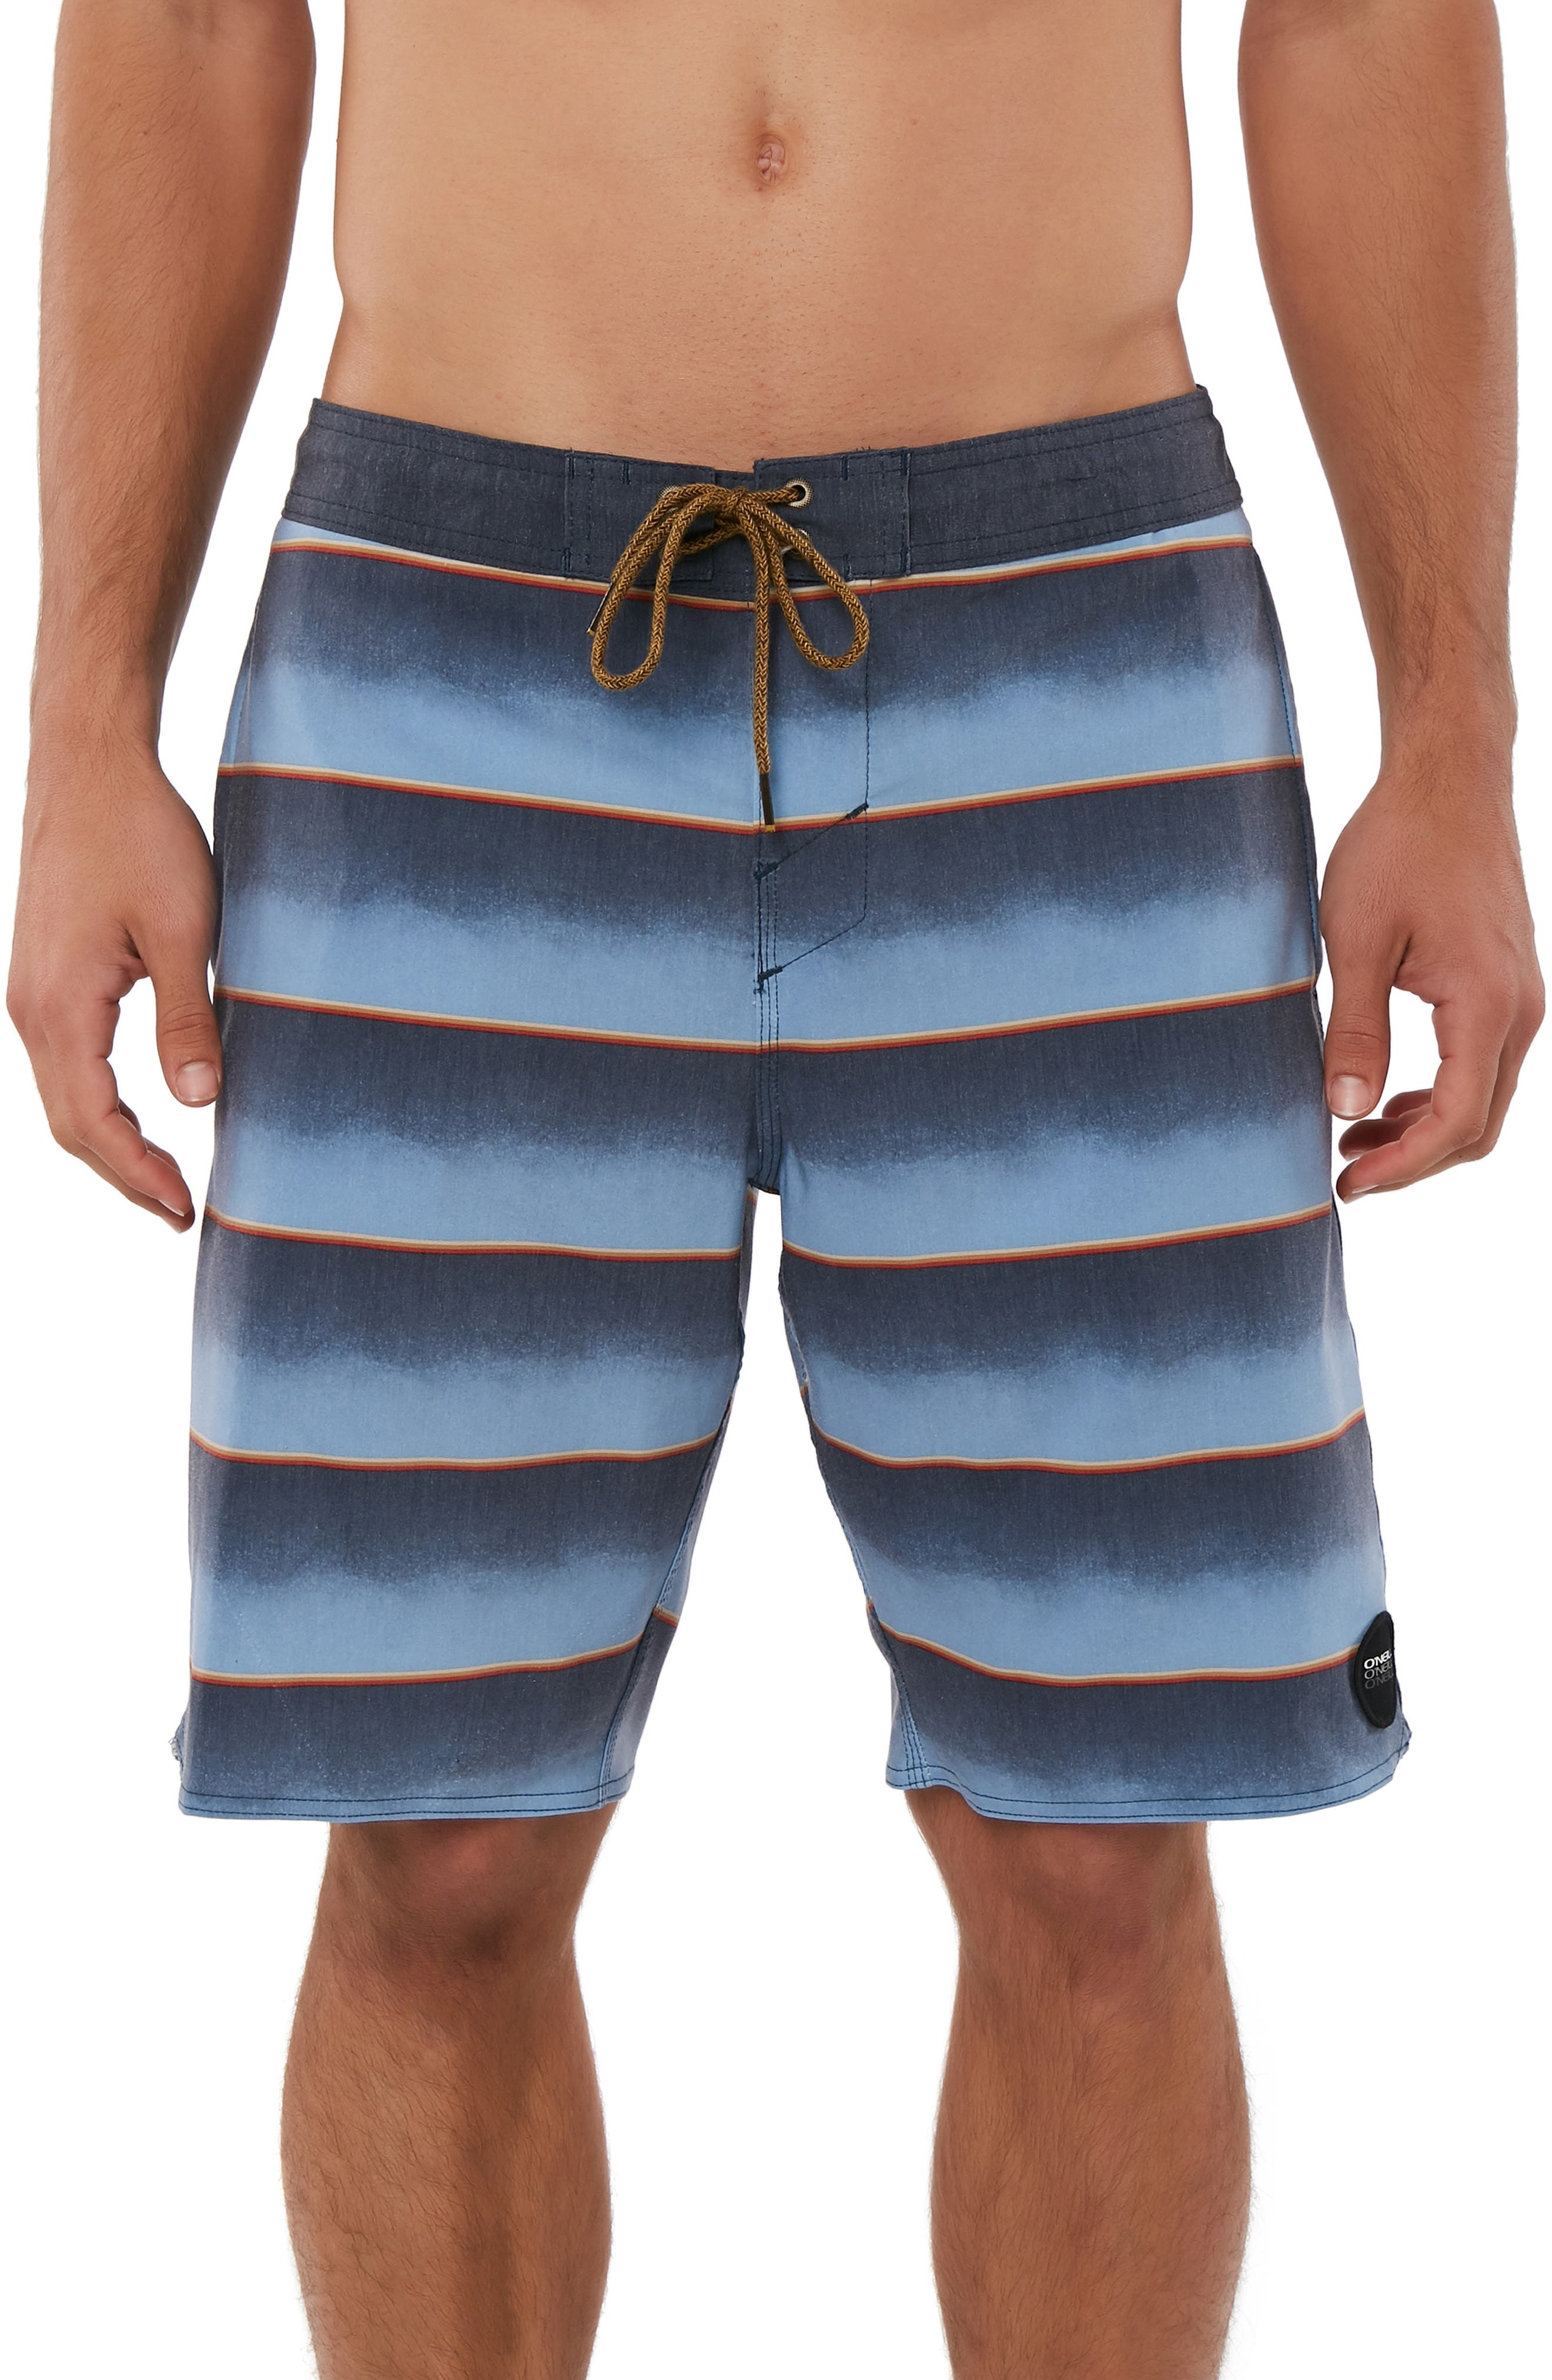 Tidelines Cruzer Board Shorts,                             Main thumbnail 1, color,                             NAVY